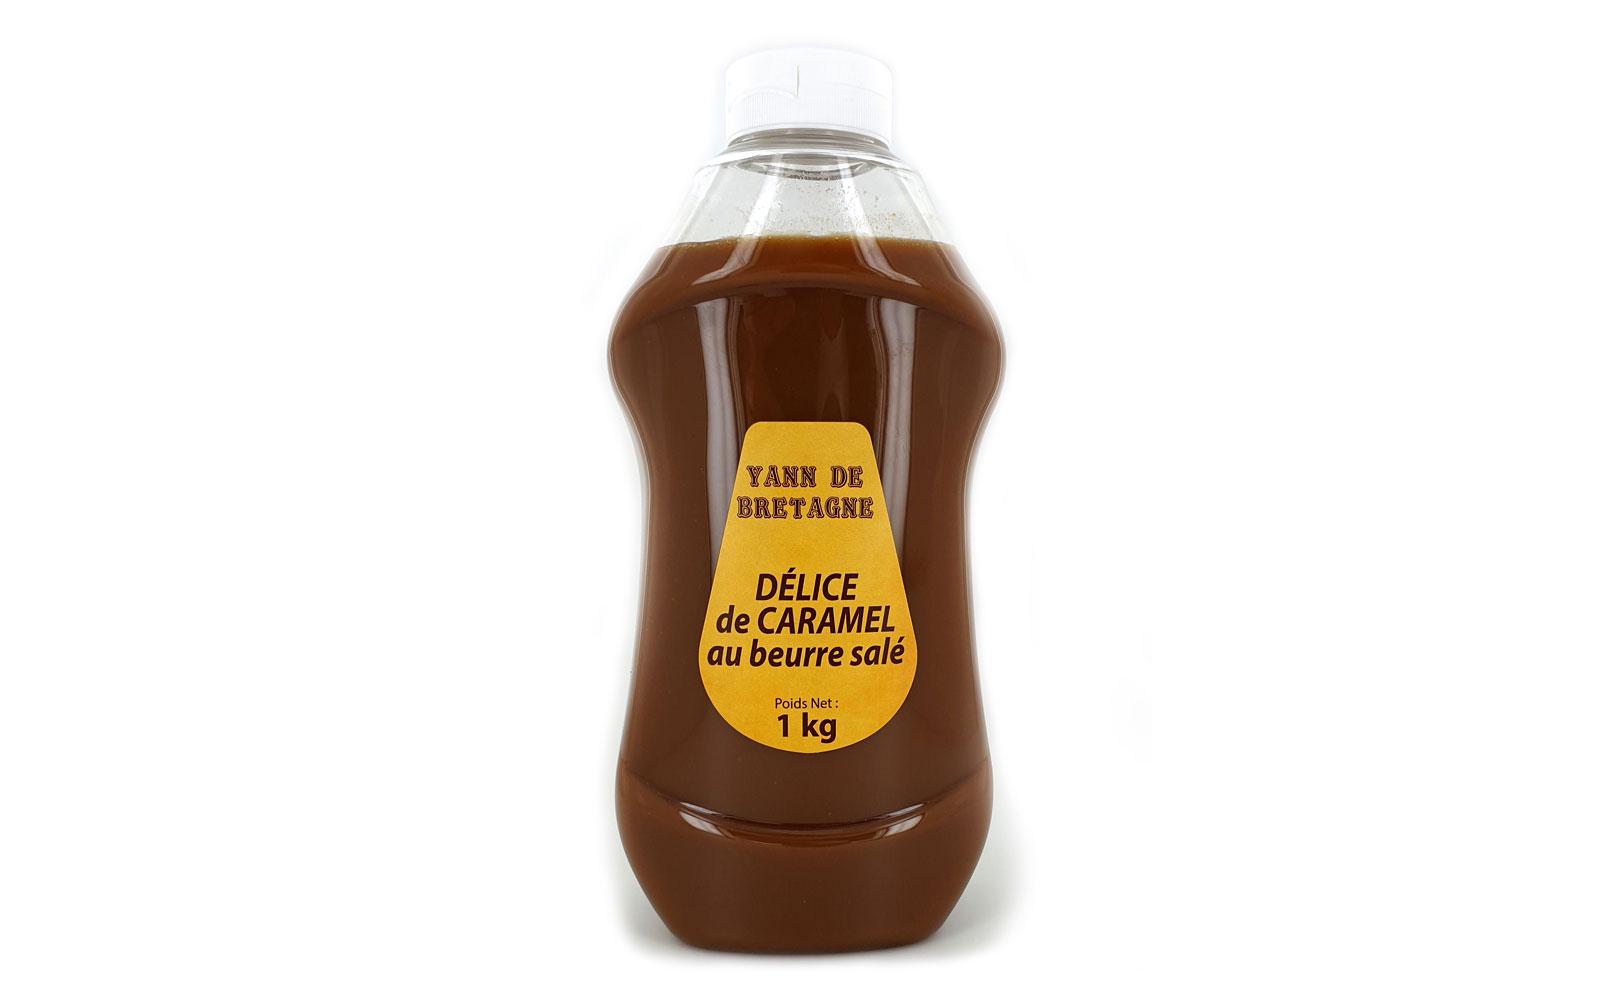 yann de bretagne delice caramel beurre sale